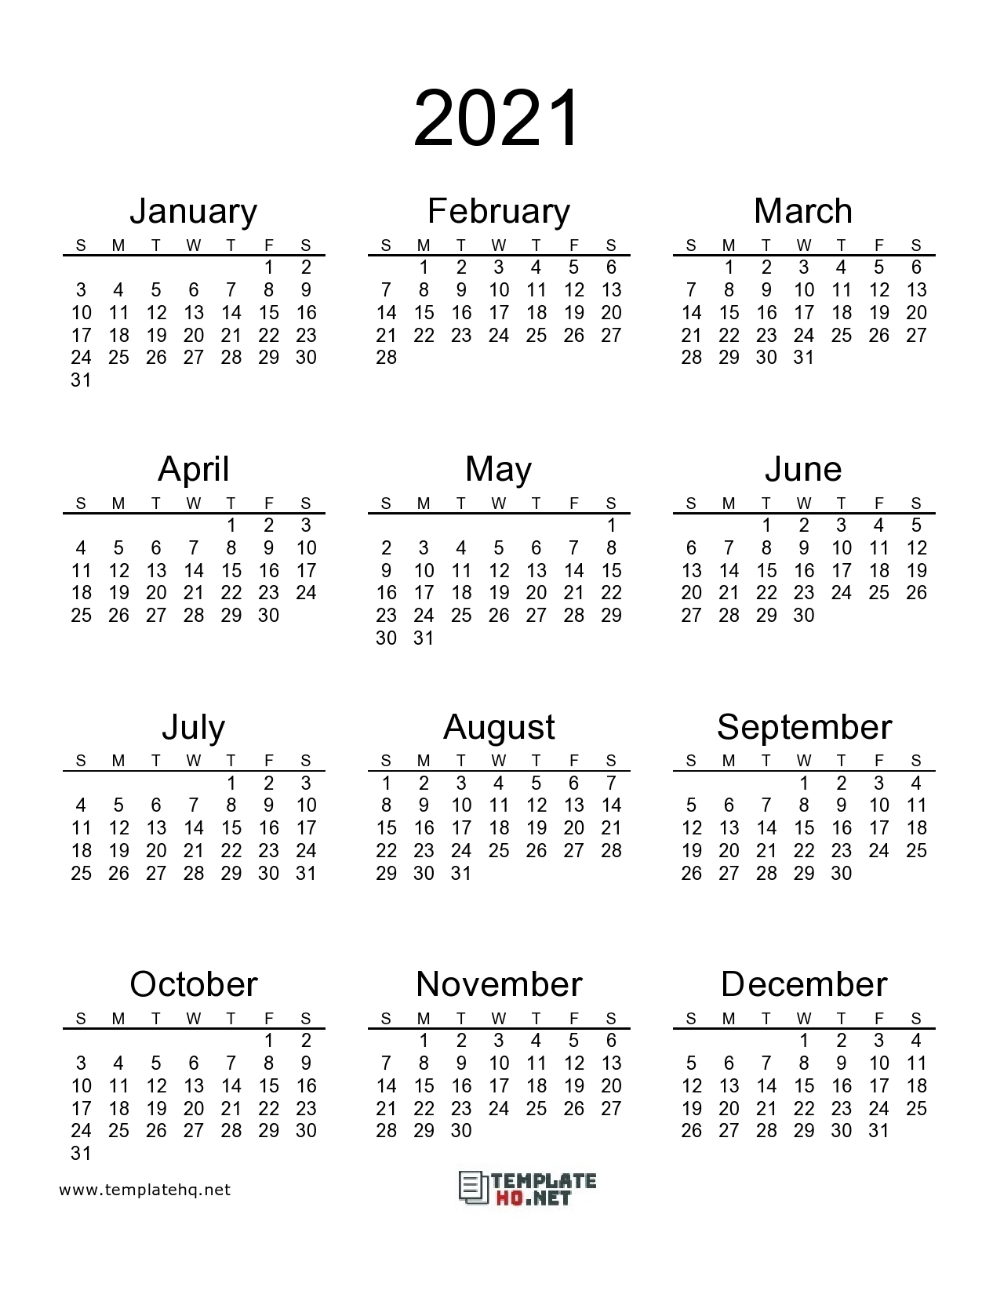 2021 Calendar Printable 00 Calendar Printables 2021 Calendar Free Printable Calendar Templates